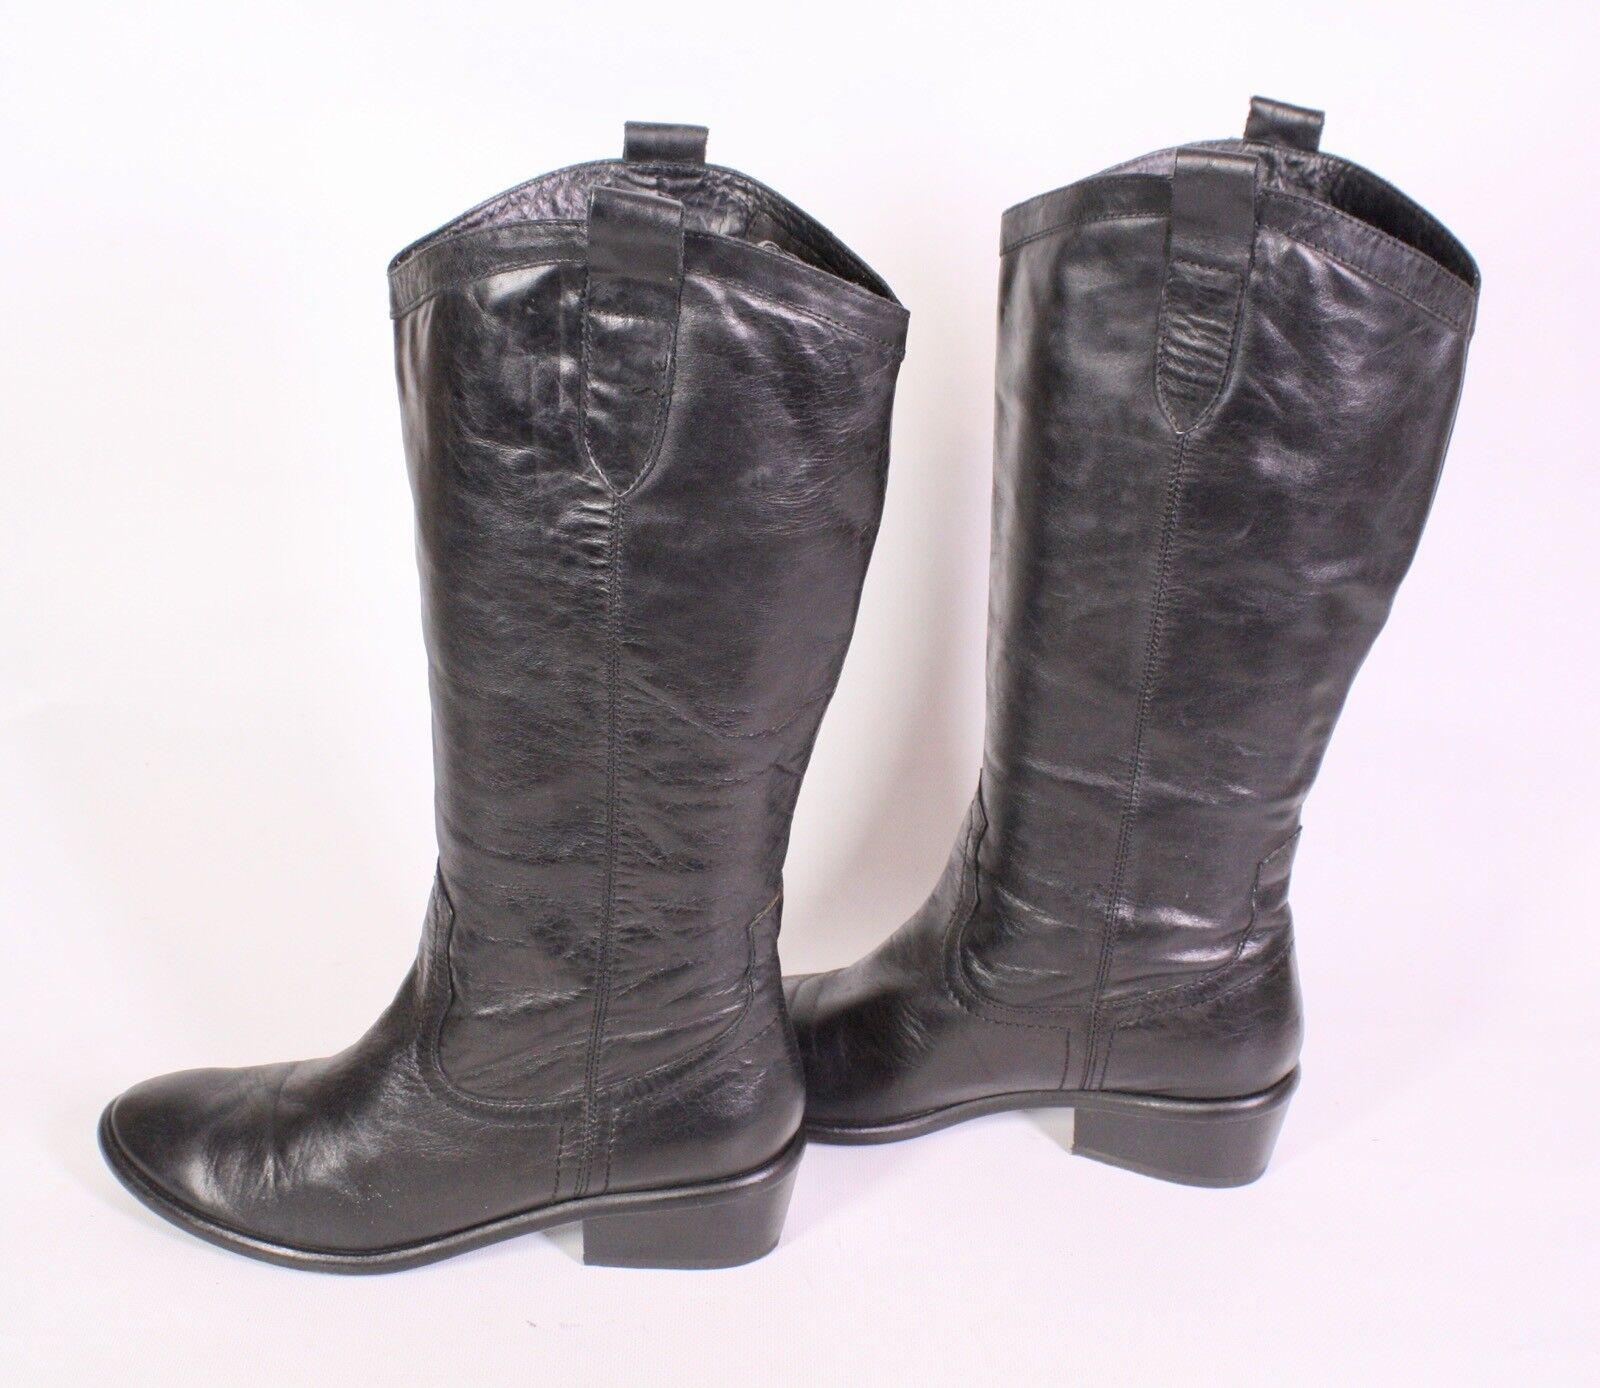 1S Buffalo Damen Stiefel Boots Leder schwarz Gr. 39 Westernlook Blockabsatz